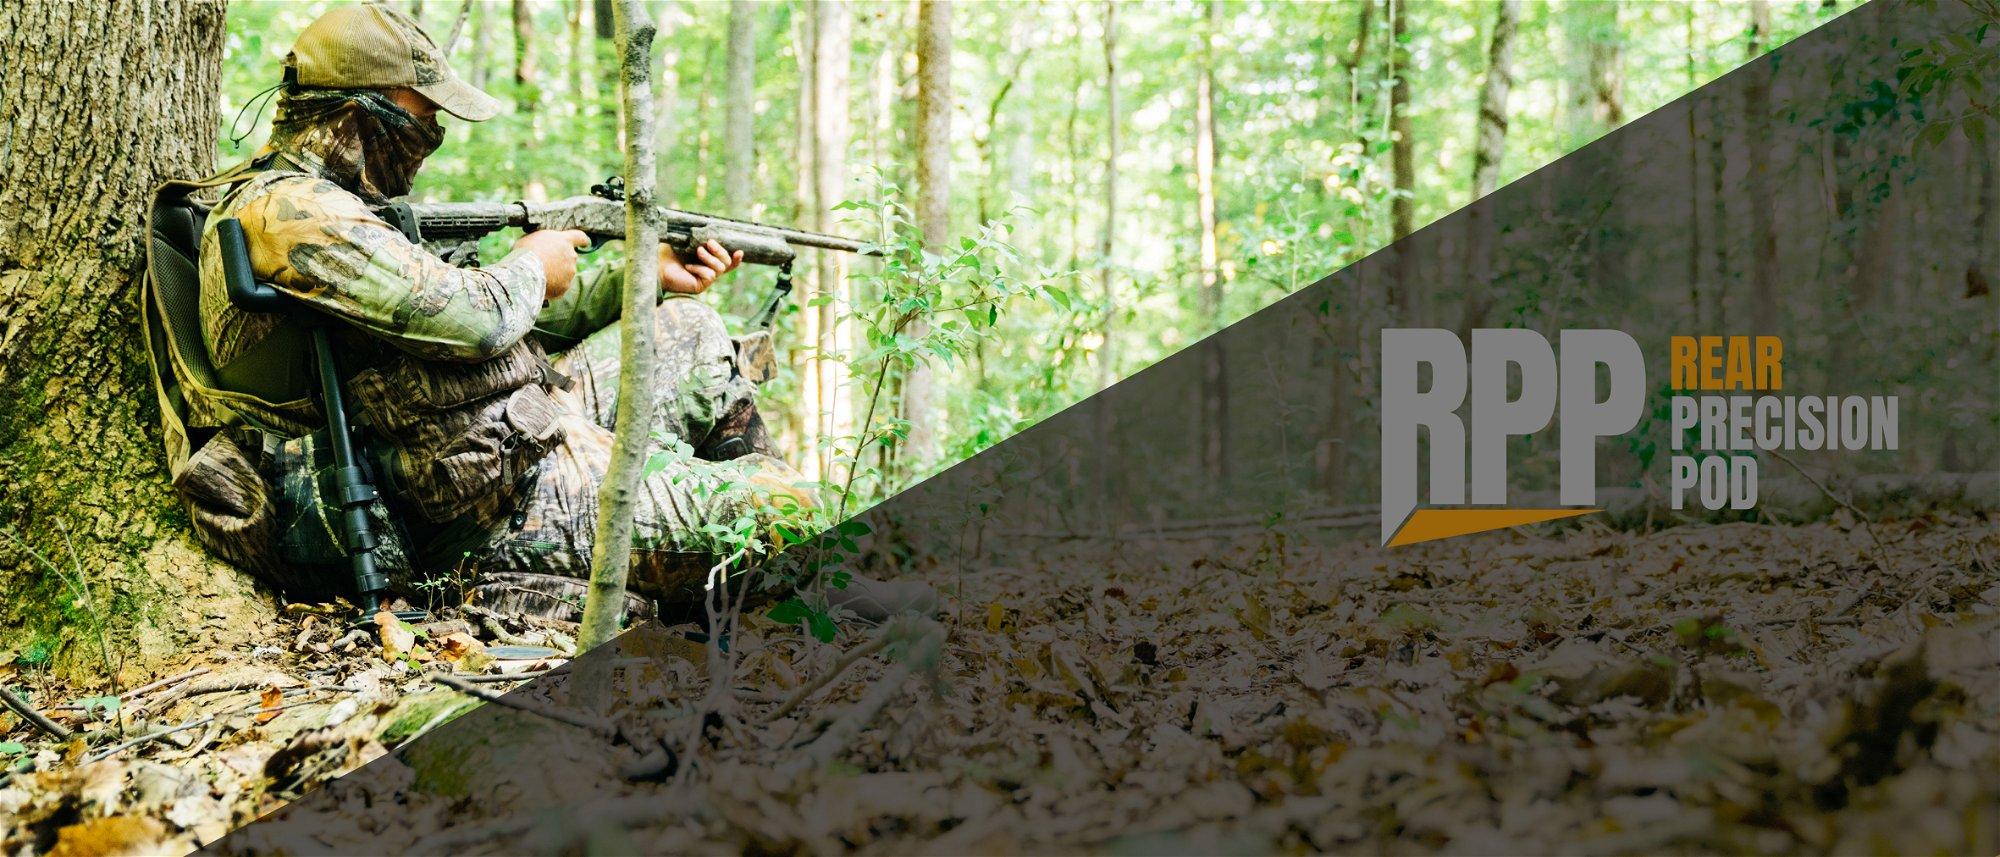 Rear Precision Pod gun stabilization system